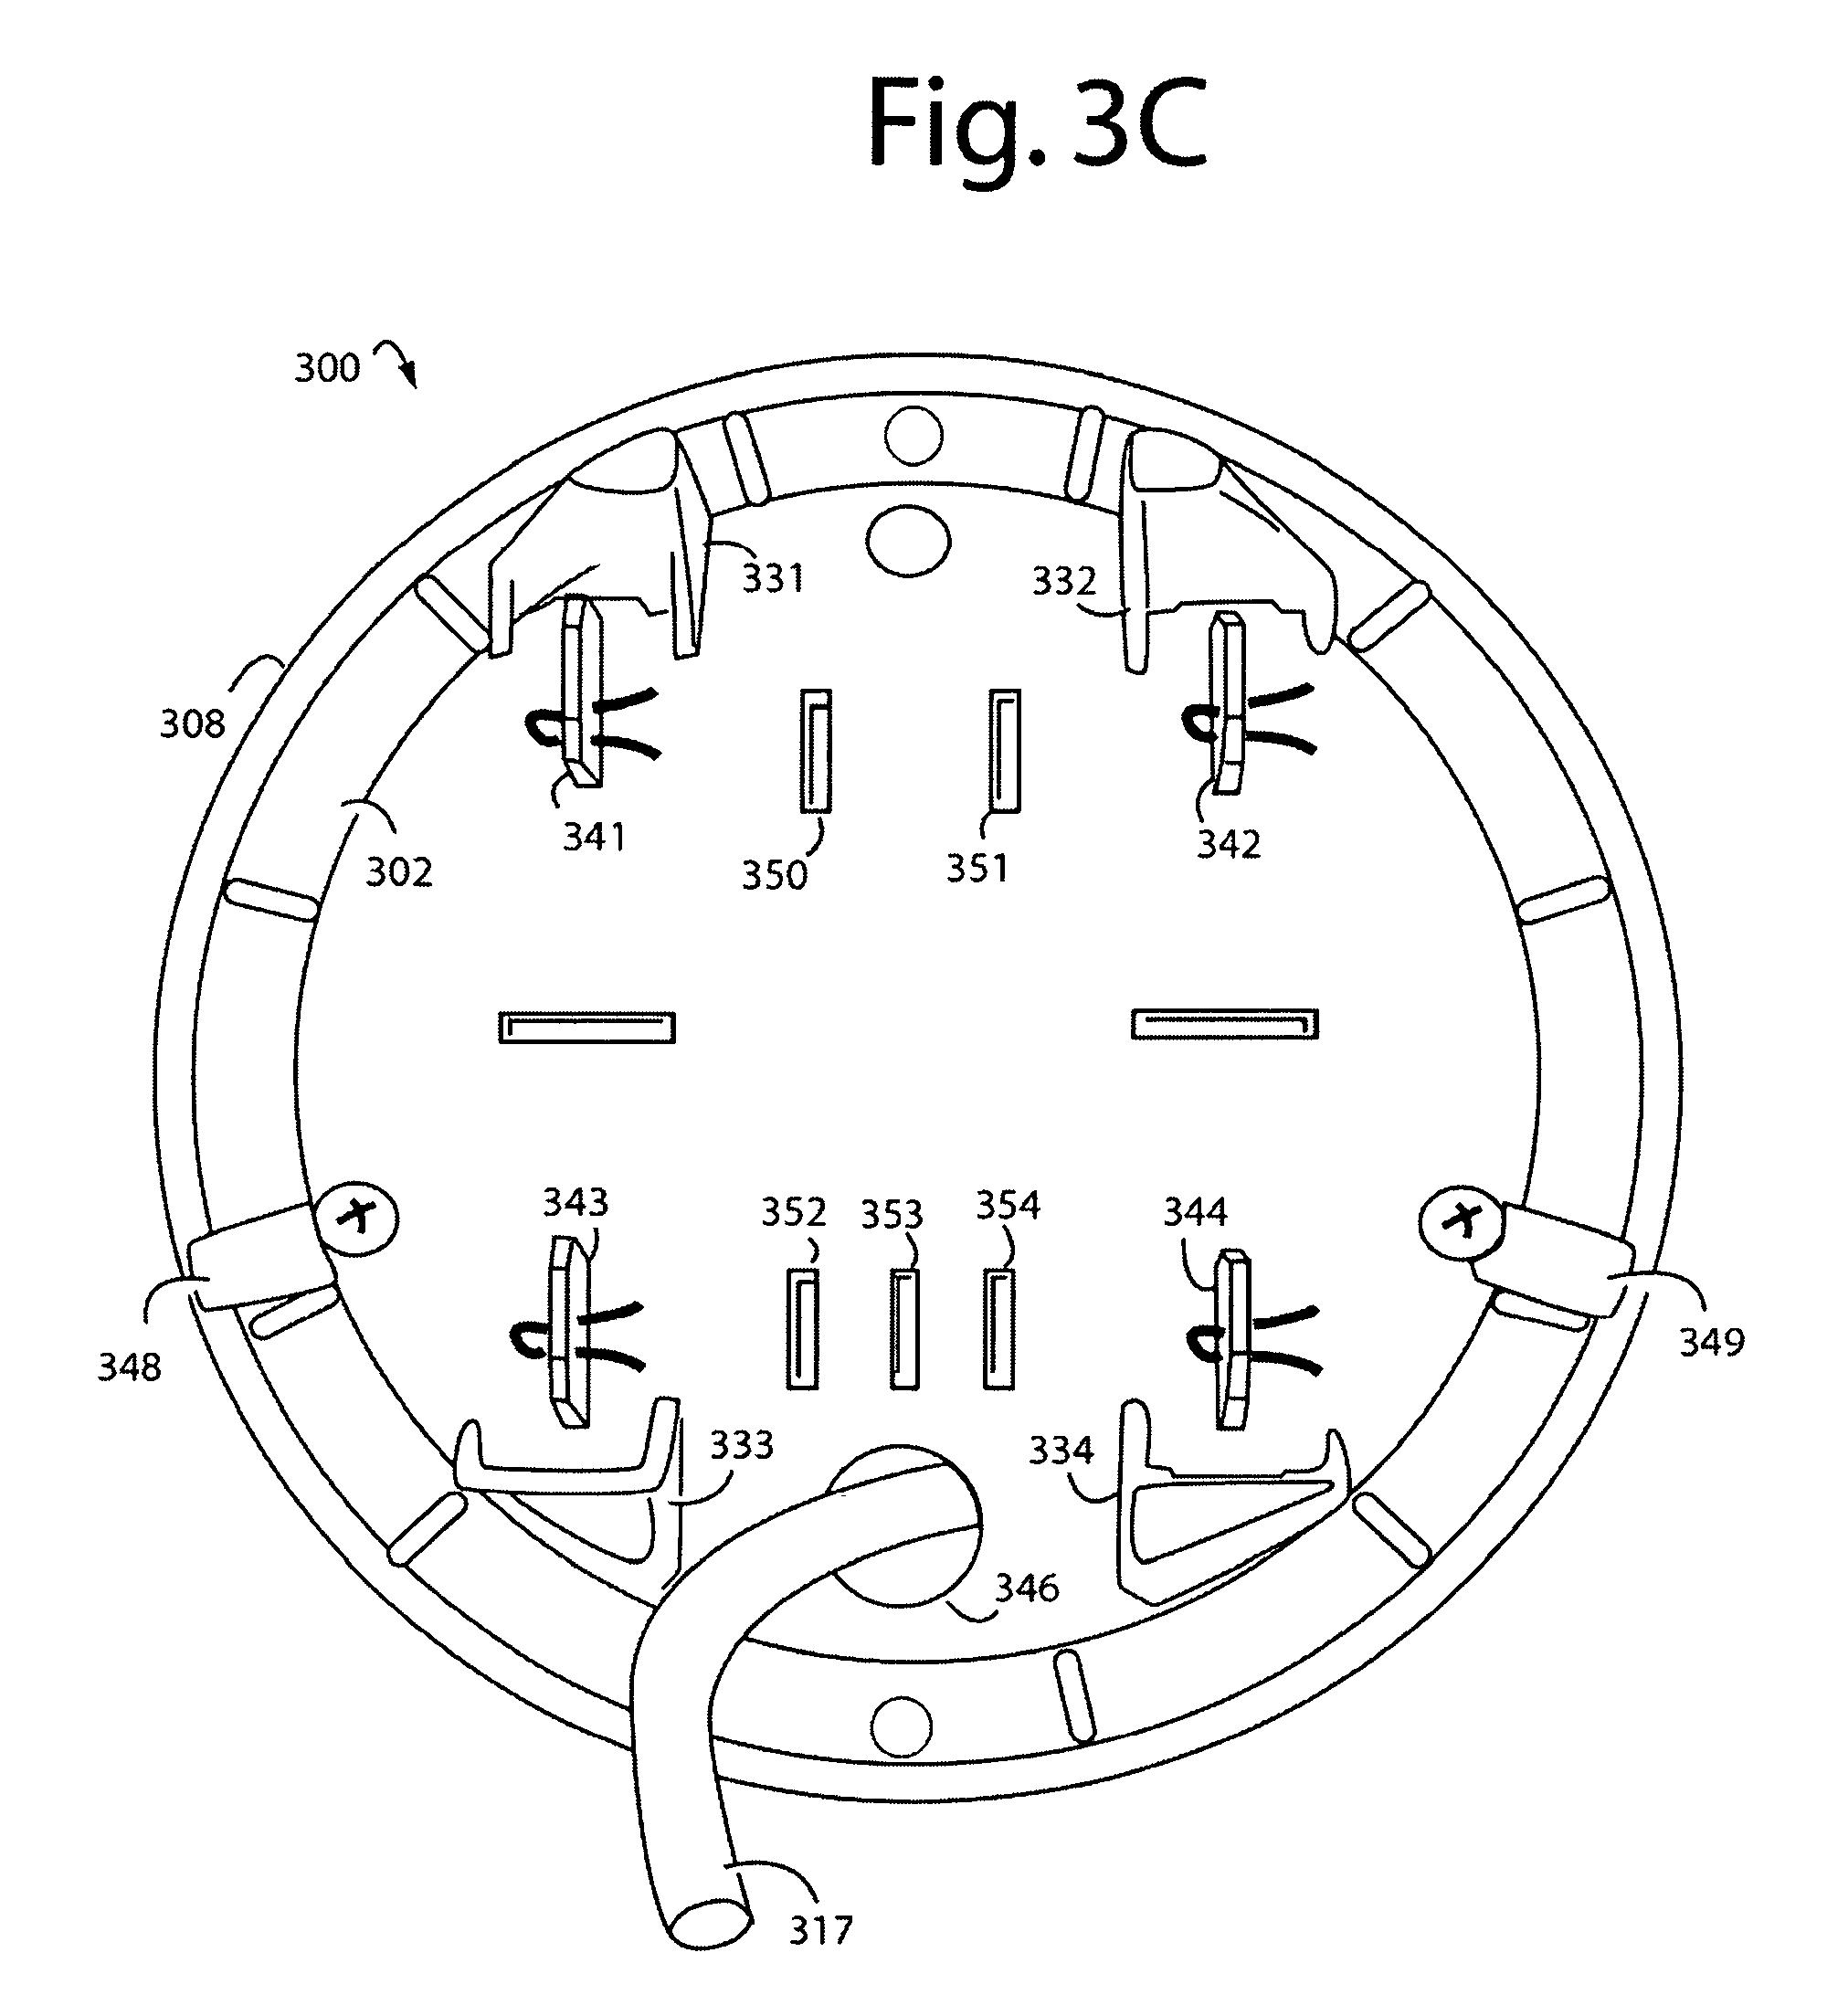 US07648389 20100119 D00004?resize=665%2C734&ssl=1 meter socket wiring diagrams wiring diagram  at gsmportal.co